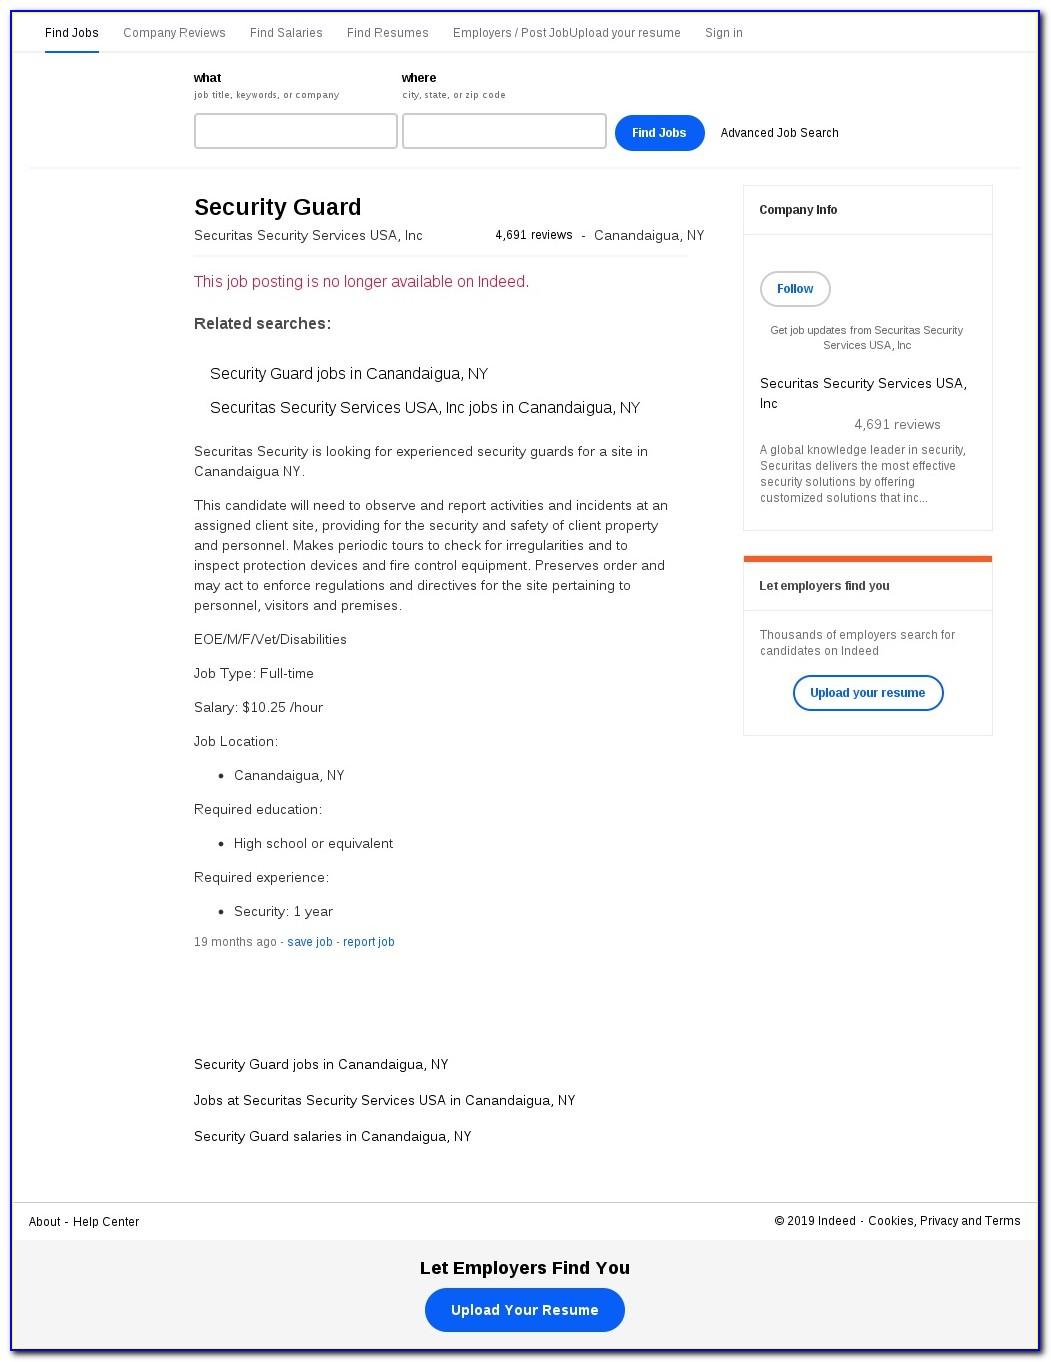 Securitas Security Employment Application